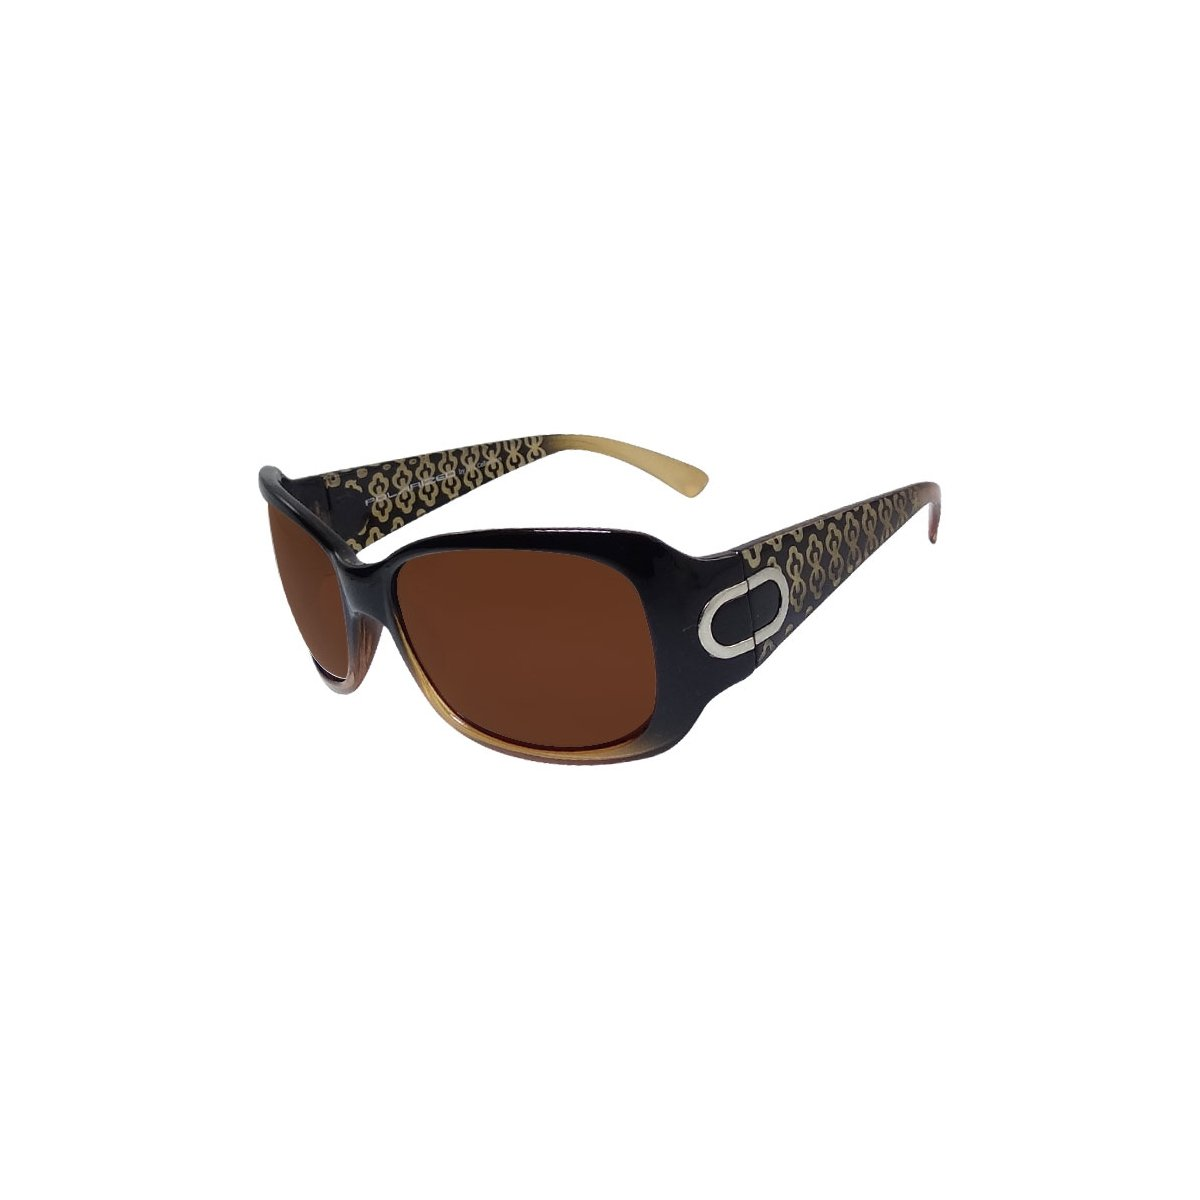 Óculos de Sol NYS Collection 8209 - Compre Agora   Zattini c793a26f78